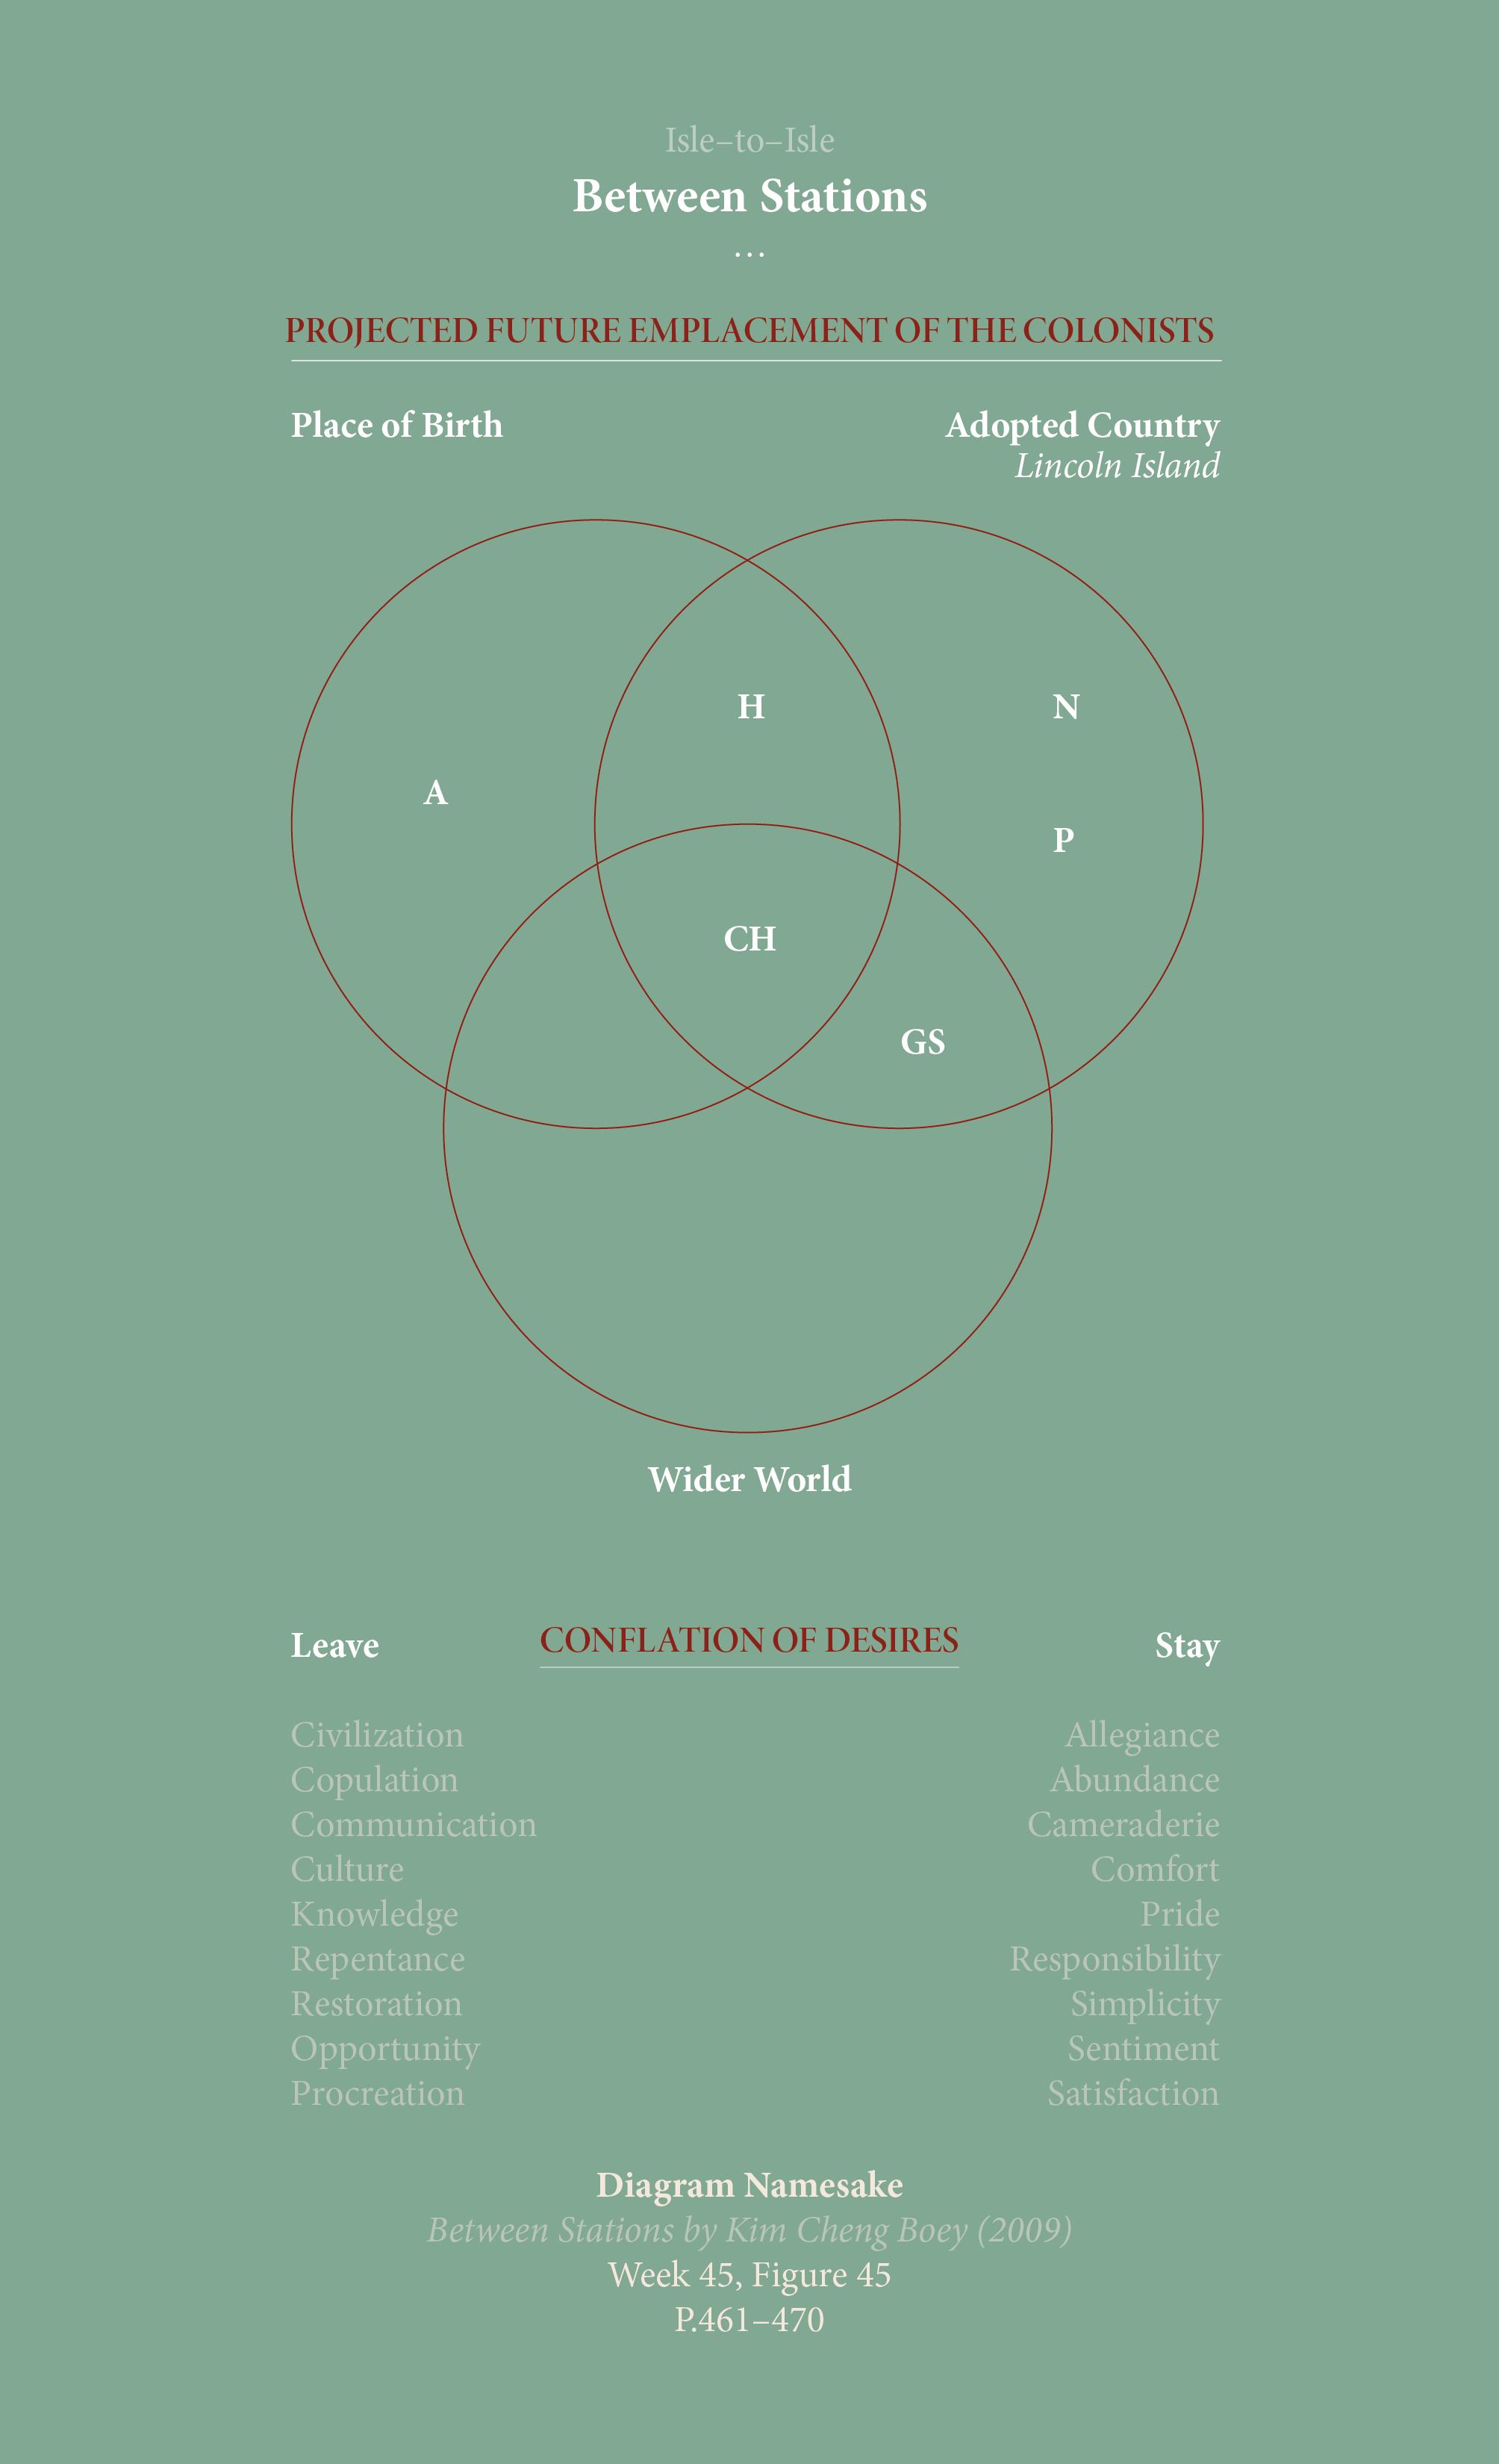 Sher Chew – Figure 45